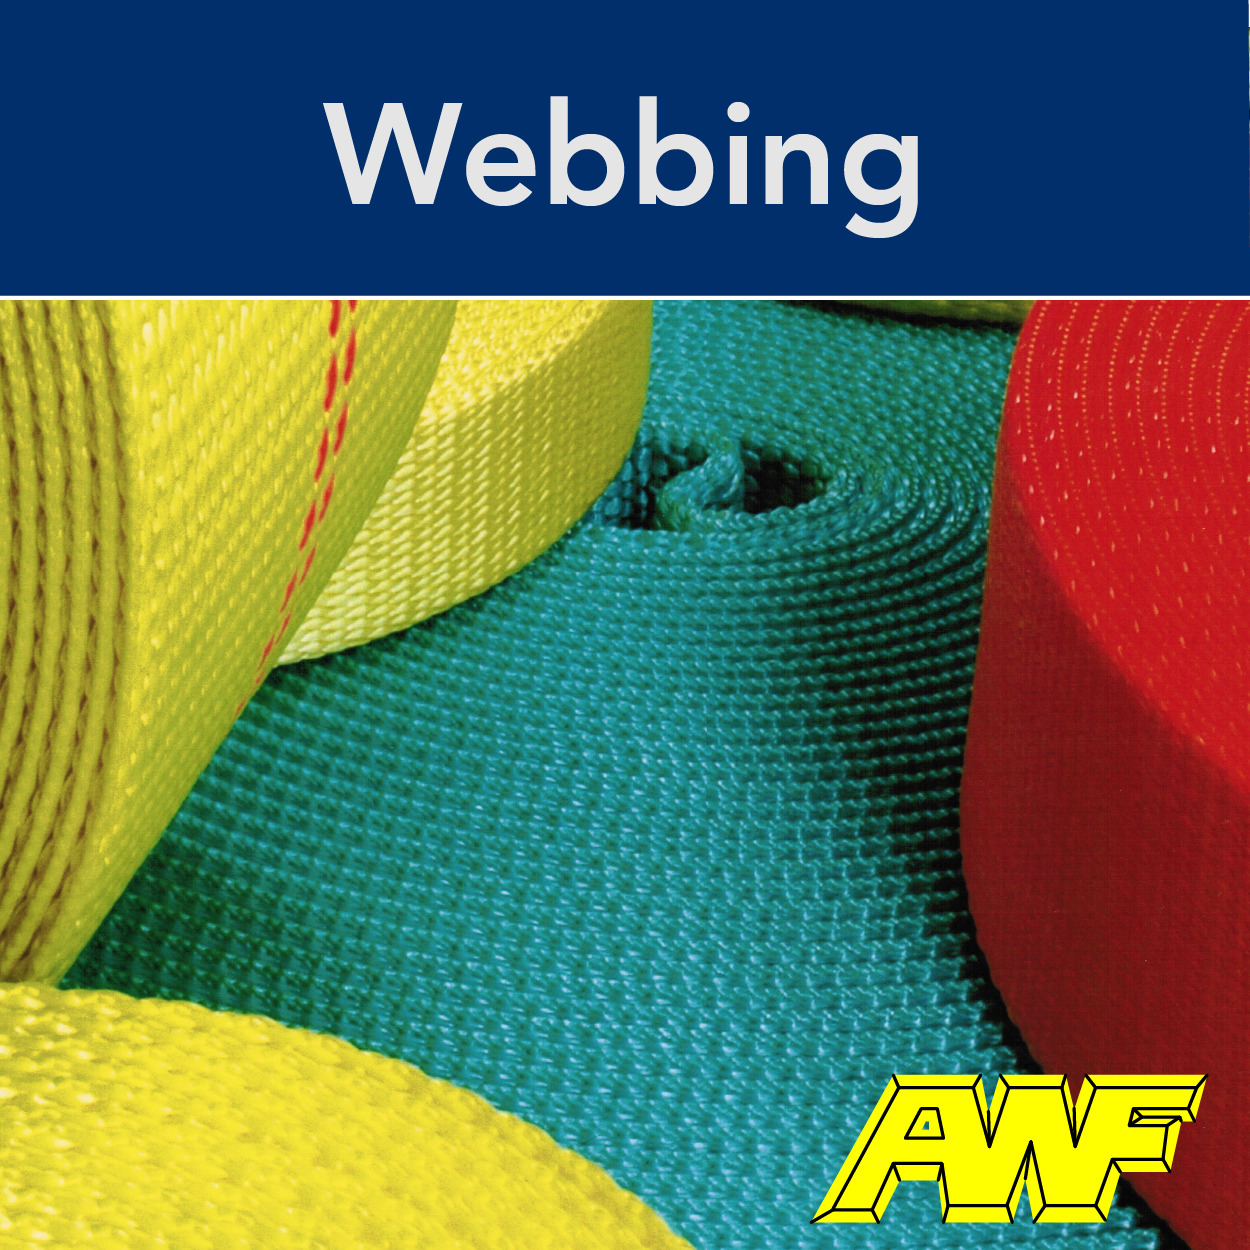 webbing-12.png